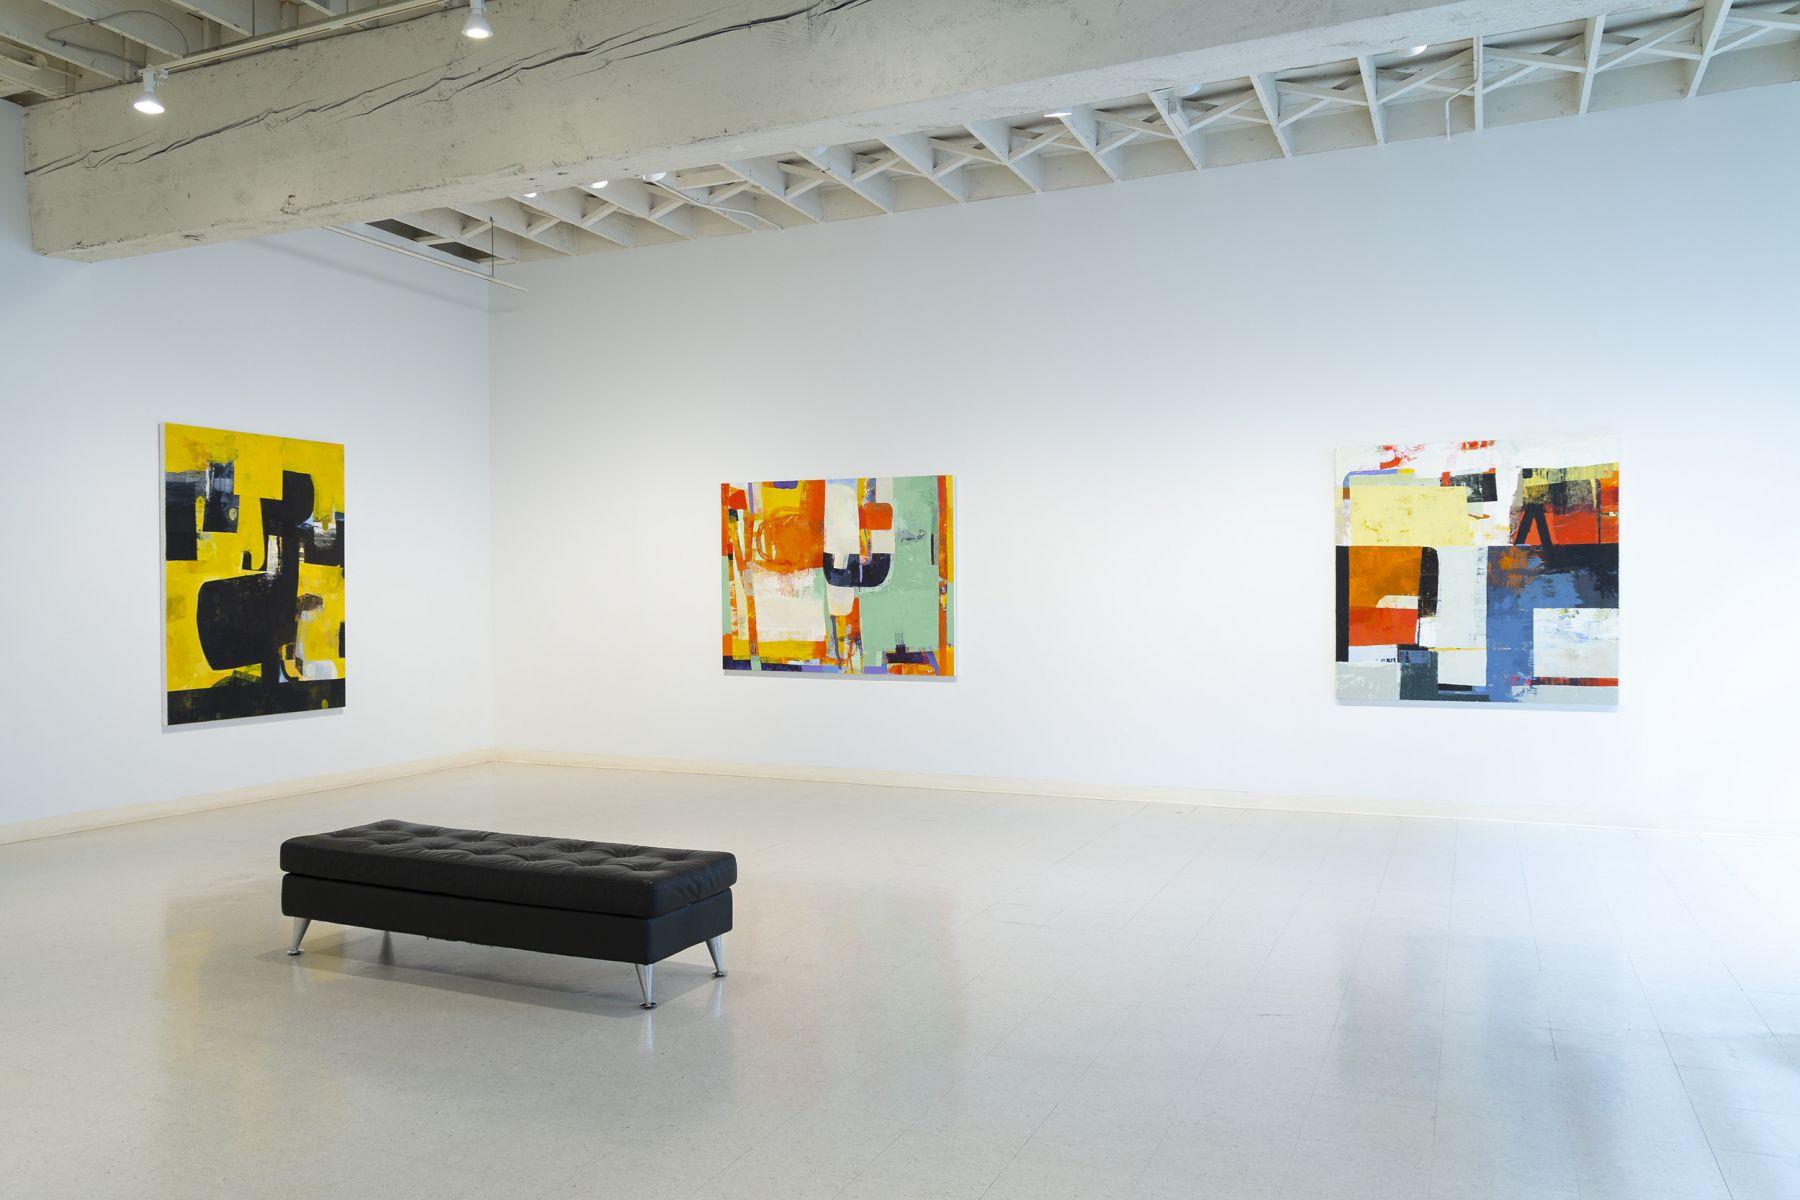 G. Lewis Clevenger - Minimis/Maximus - June 2019 - Installation View 03